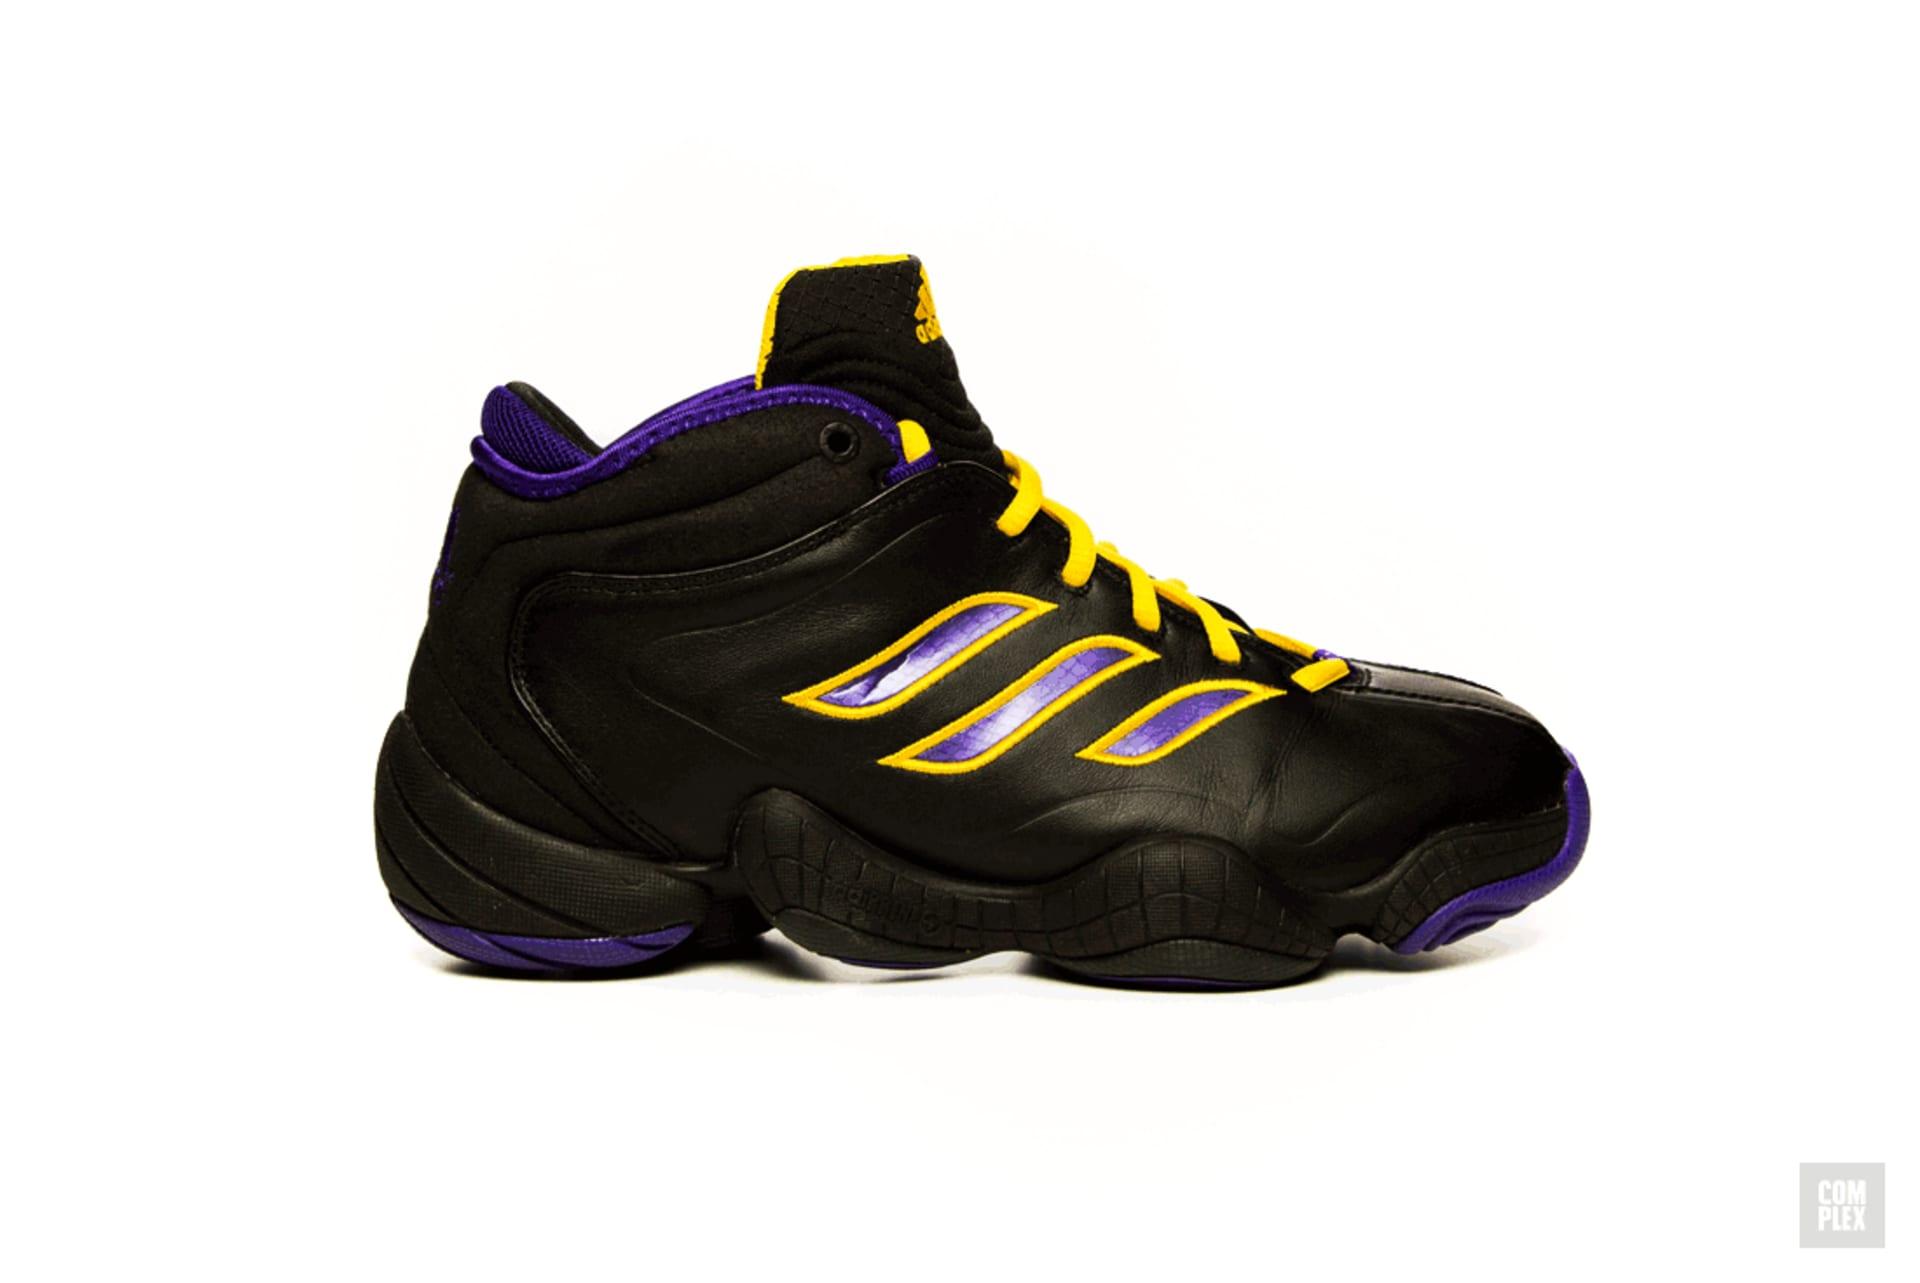 d021fc76d87f Kobe Bryant Signature Sneaker Design Evolution